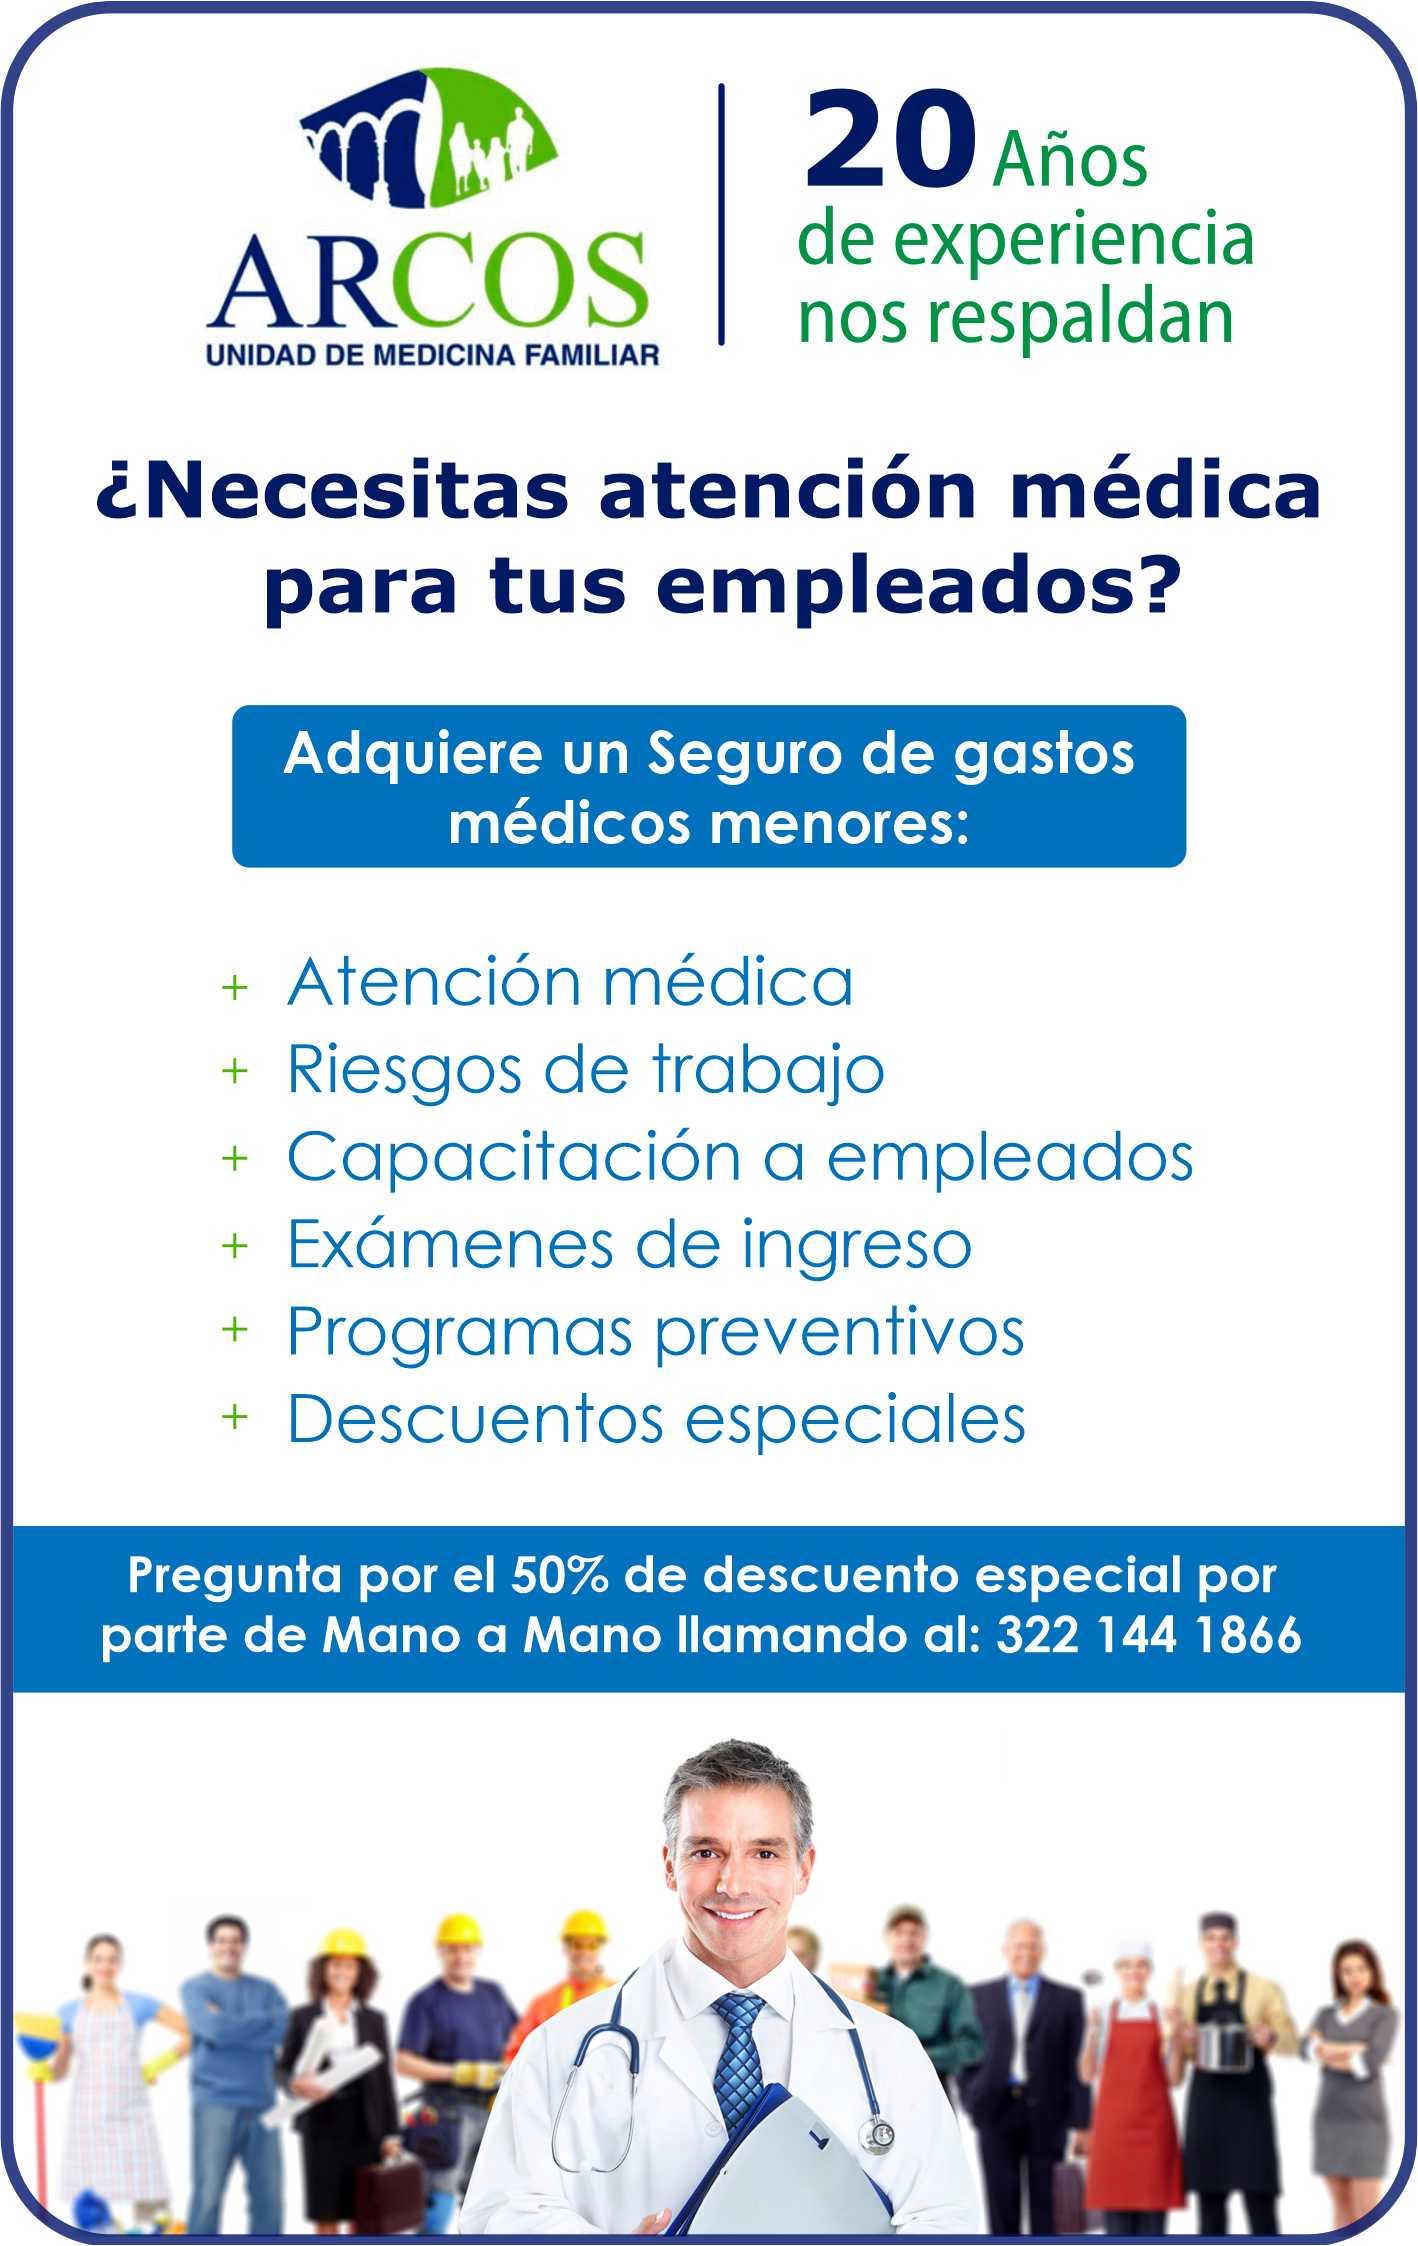 Servicios medicos arcos dise%c3%91o